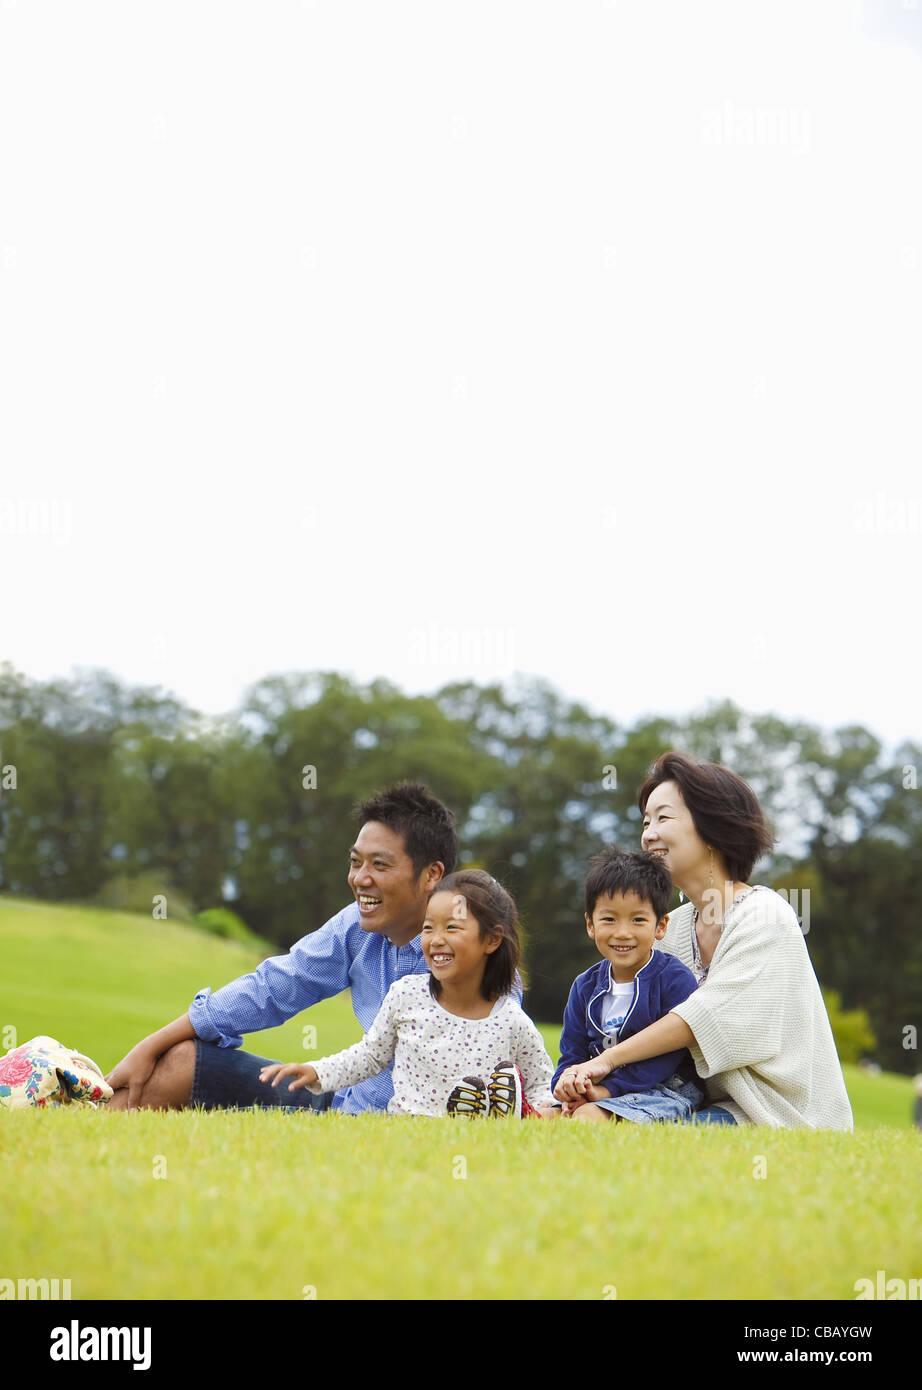 Picnicking family - Stock Image